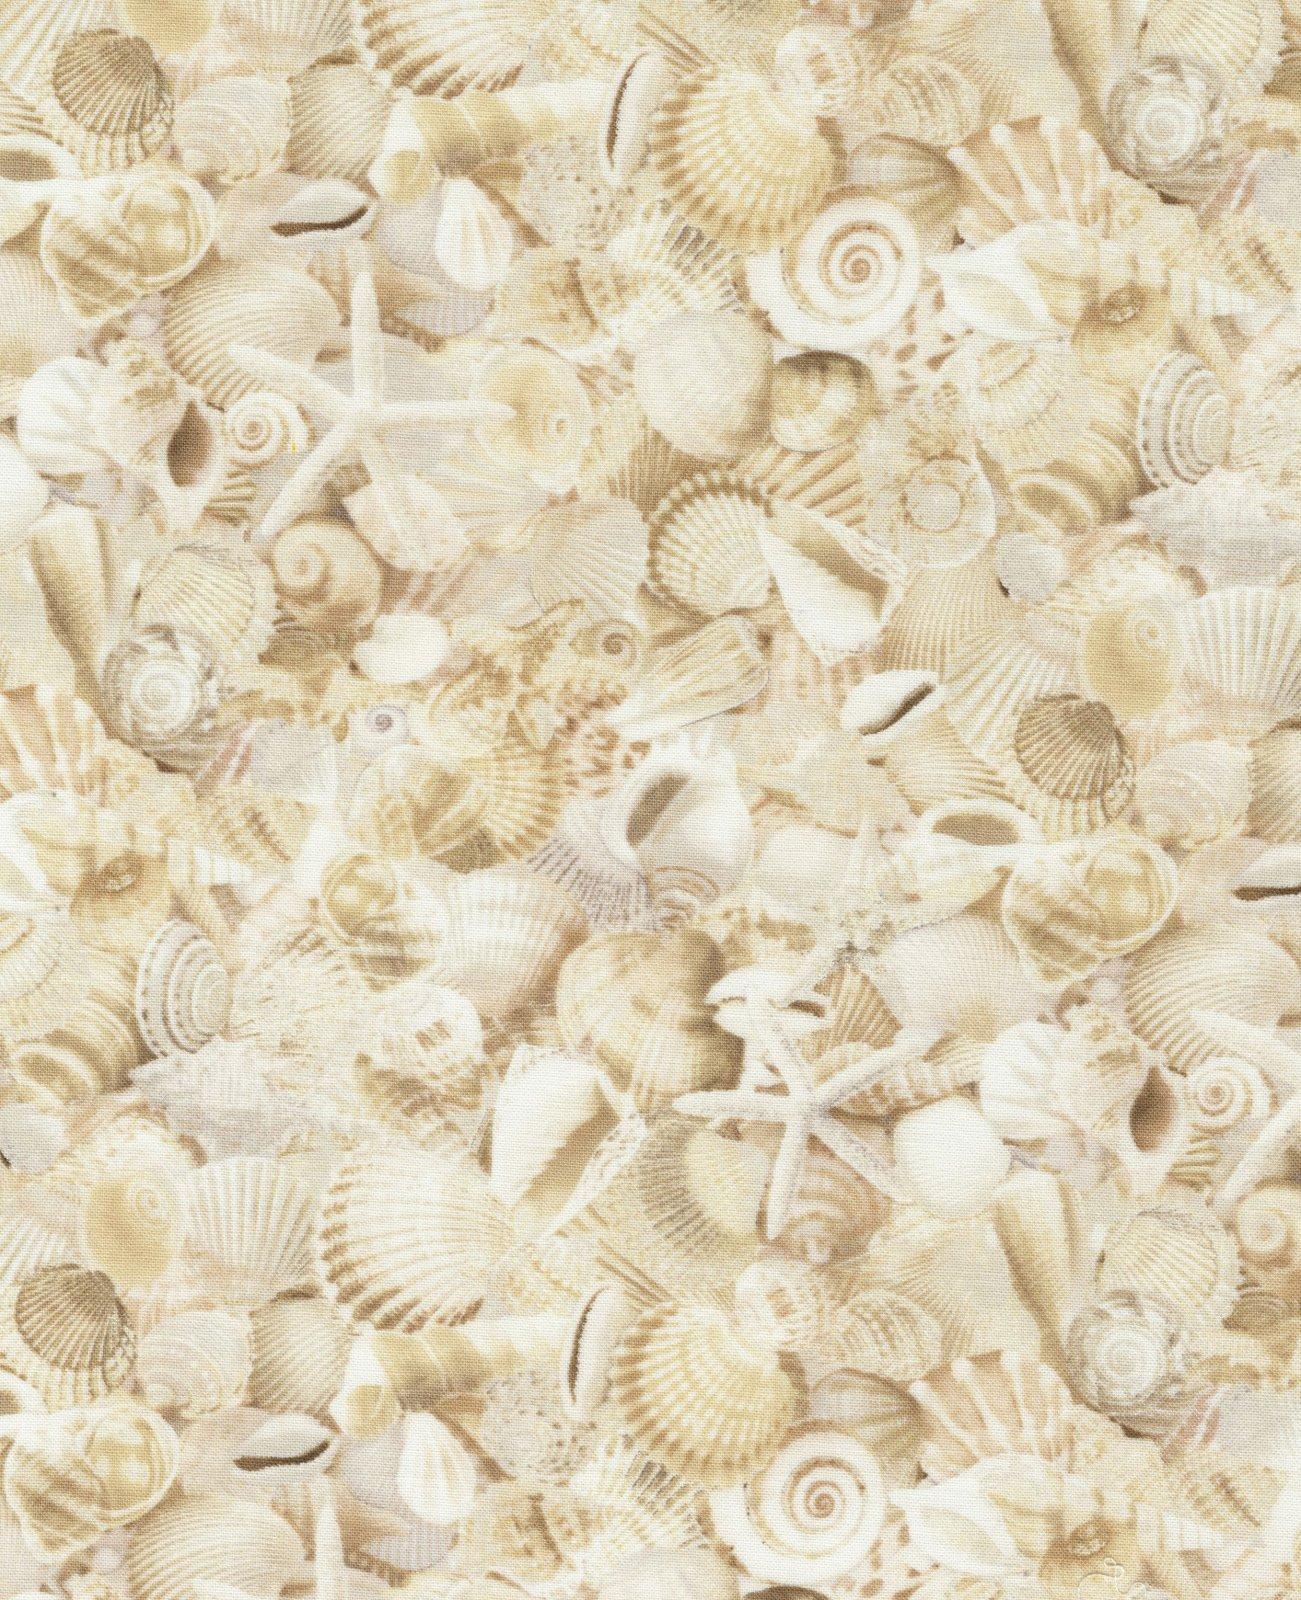 1905 Natural Seashells